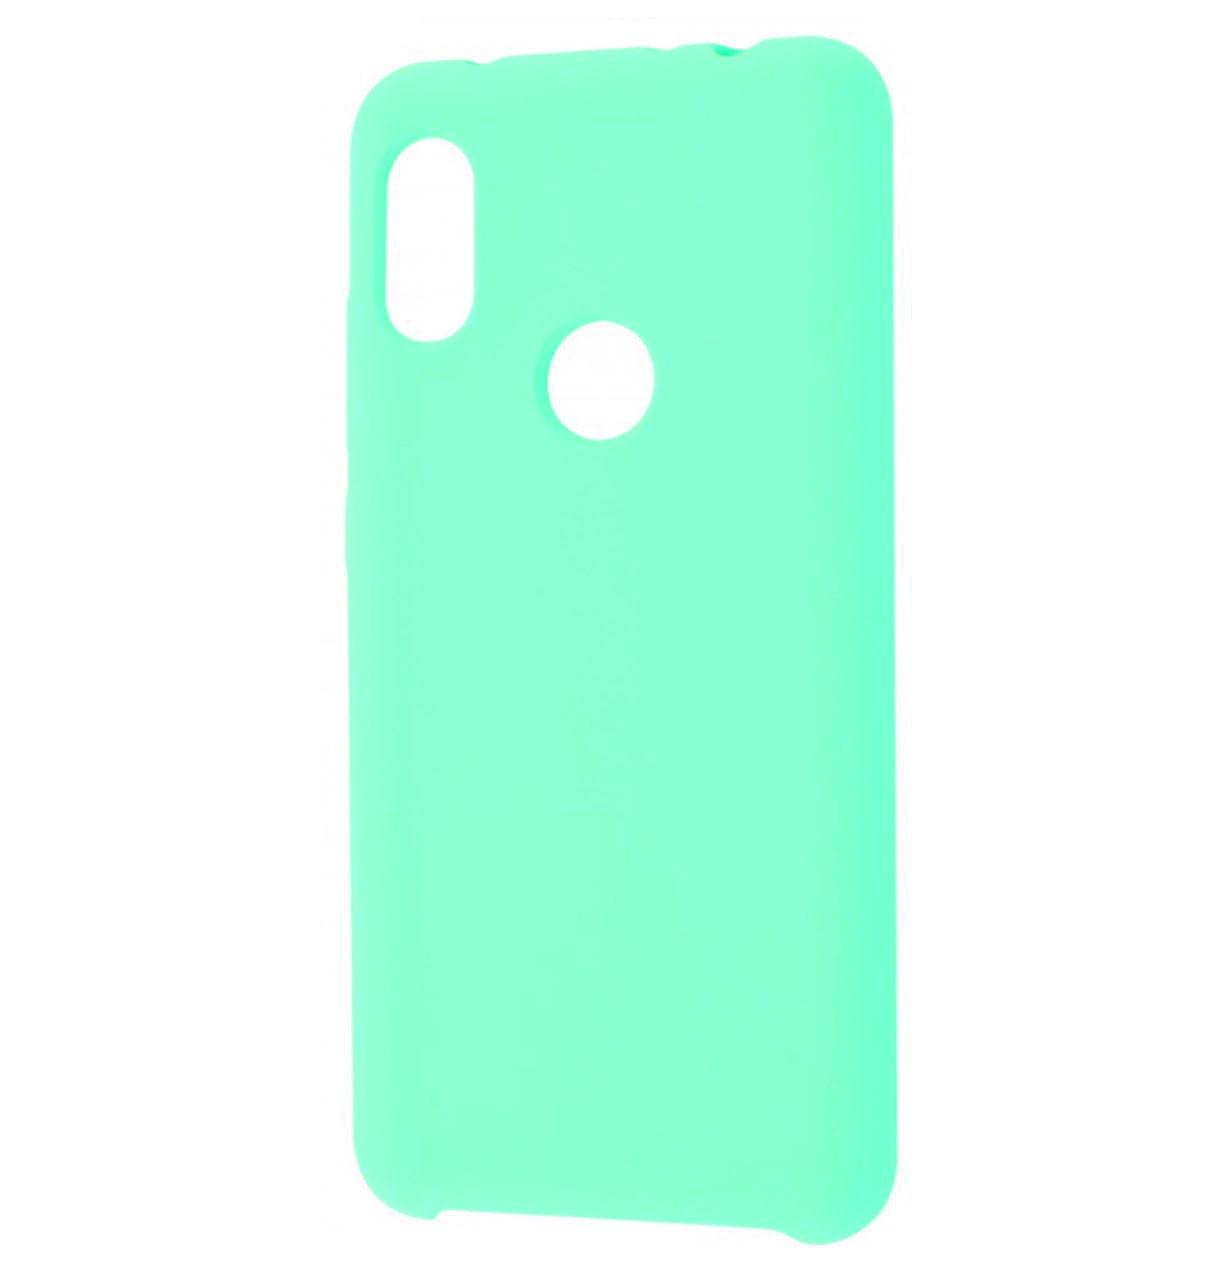 Чехол-накладка Original Silicone case на Xiaomi Redmi Note 6 Pro Mint